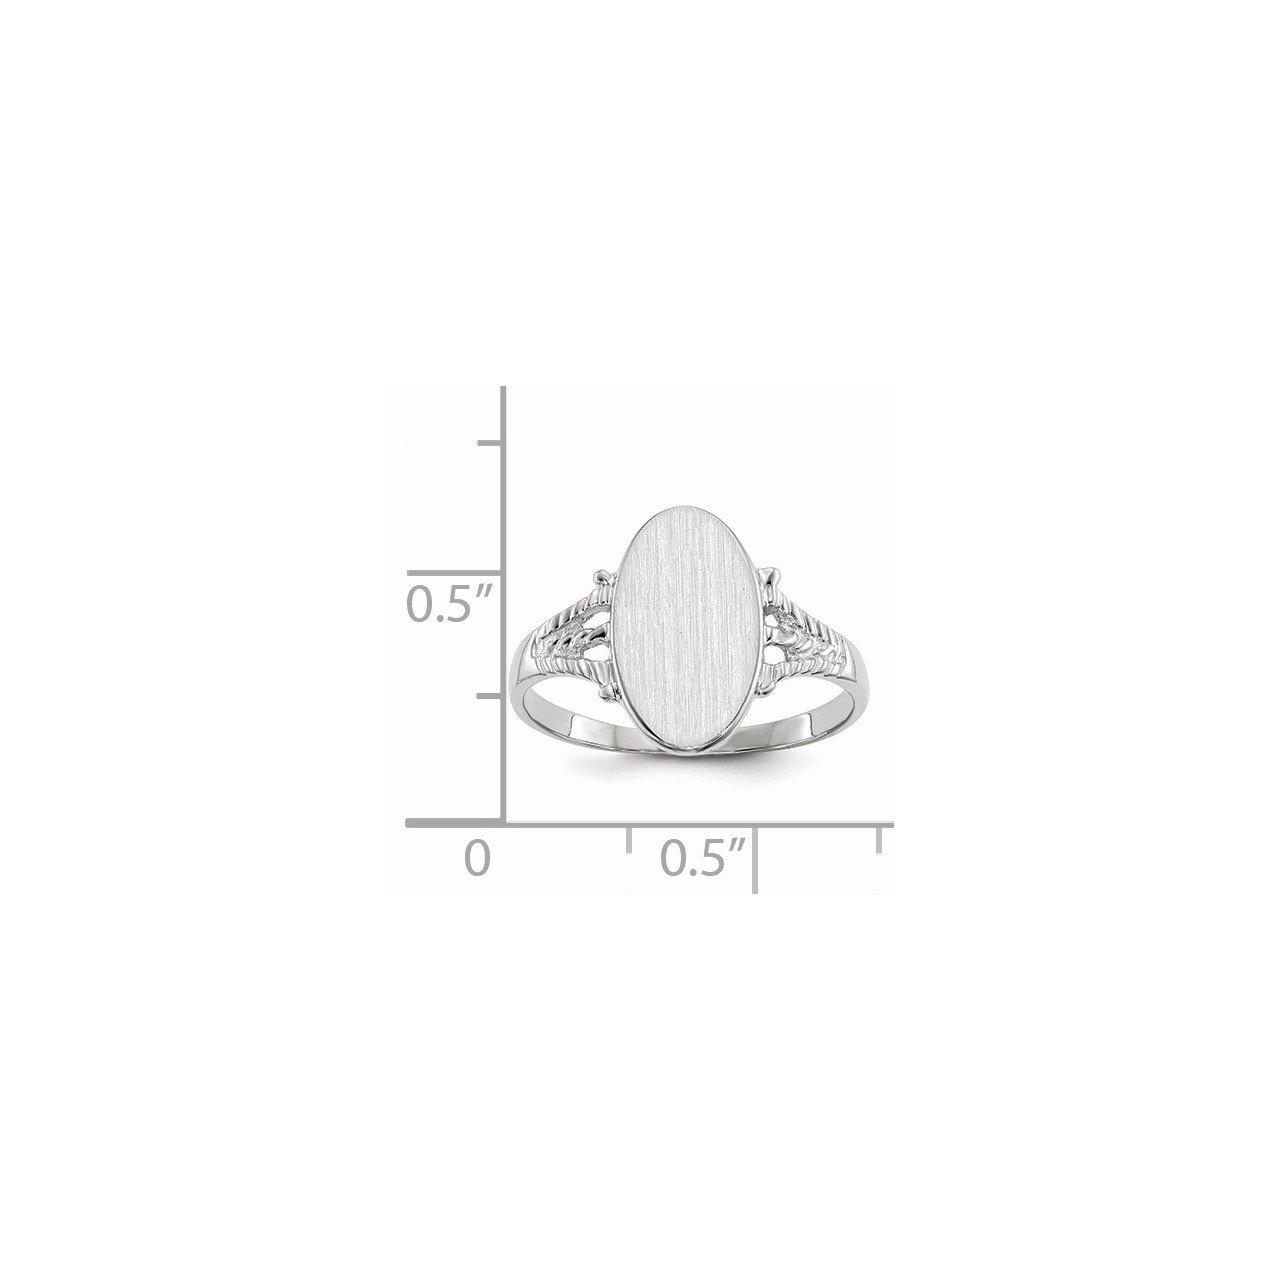 14k White Gold 13.5x8.5mm Closed Back Signet Ring-4